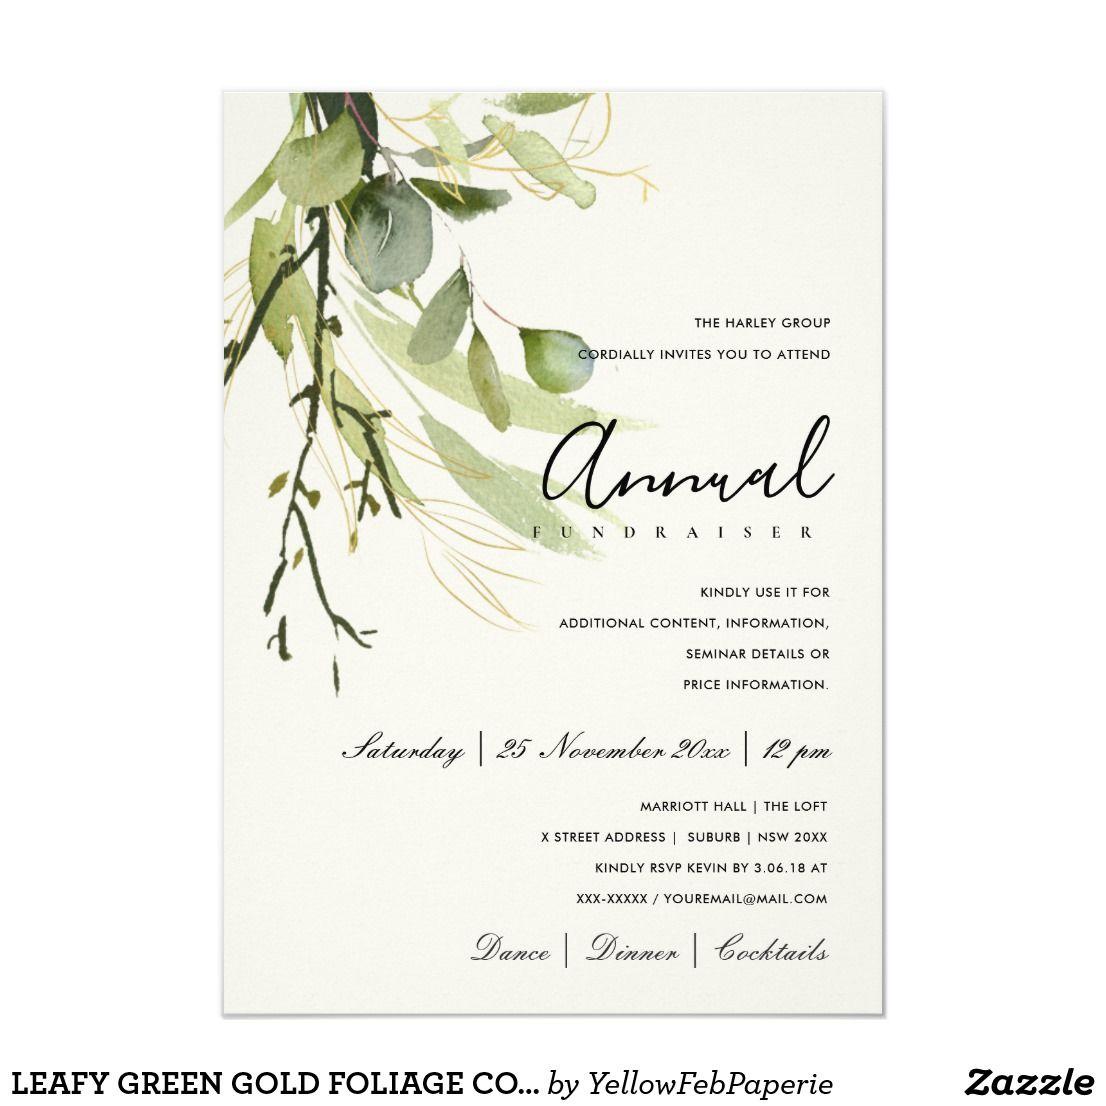 Leafy green gold foliage corporate party event invitation